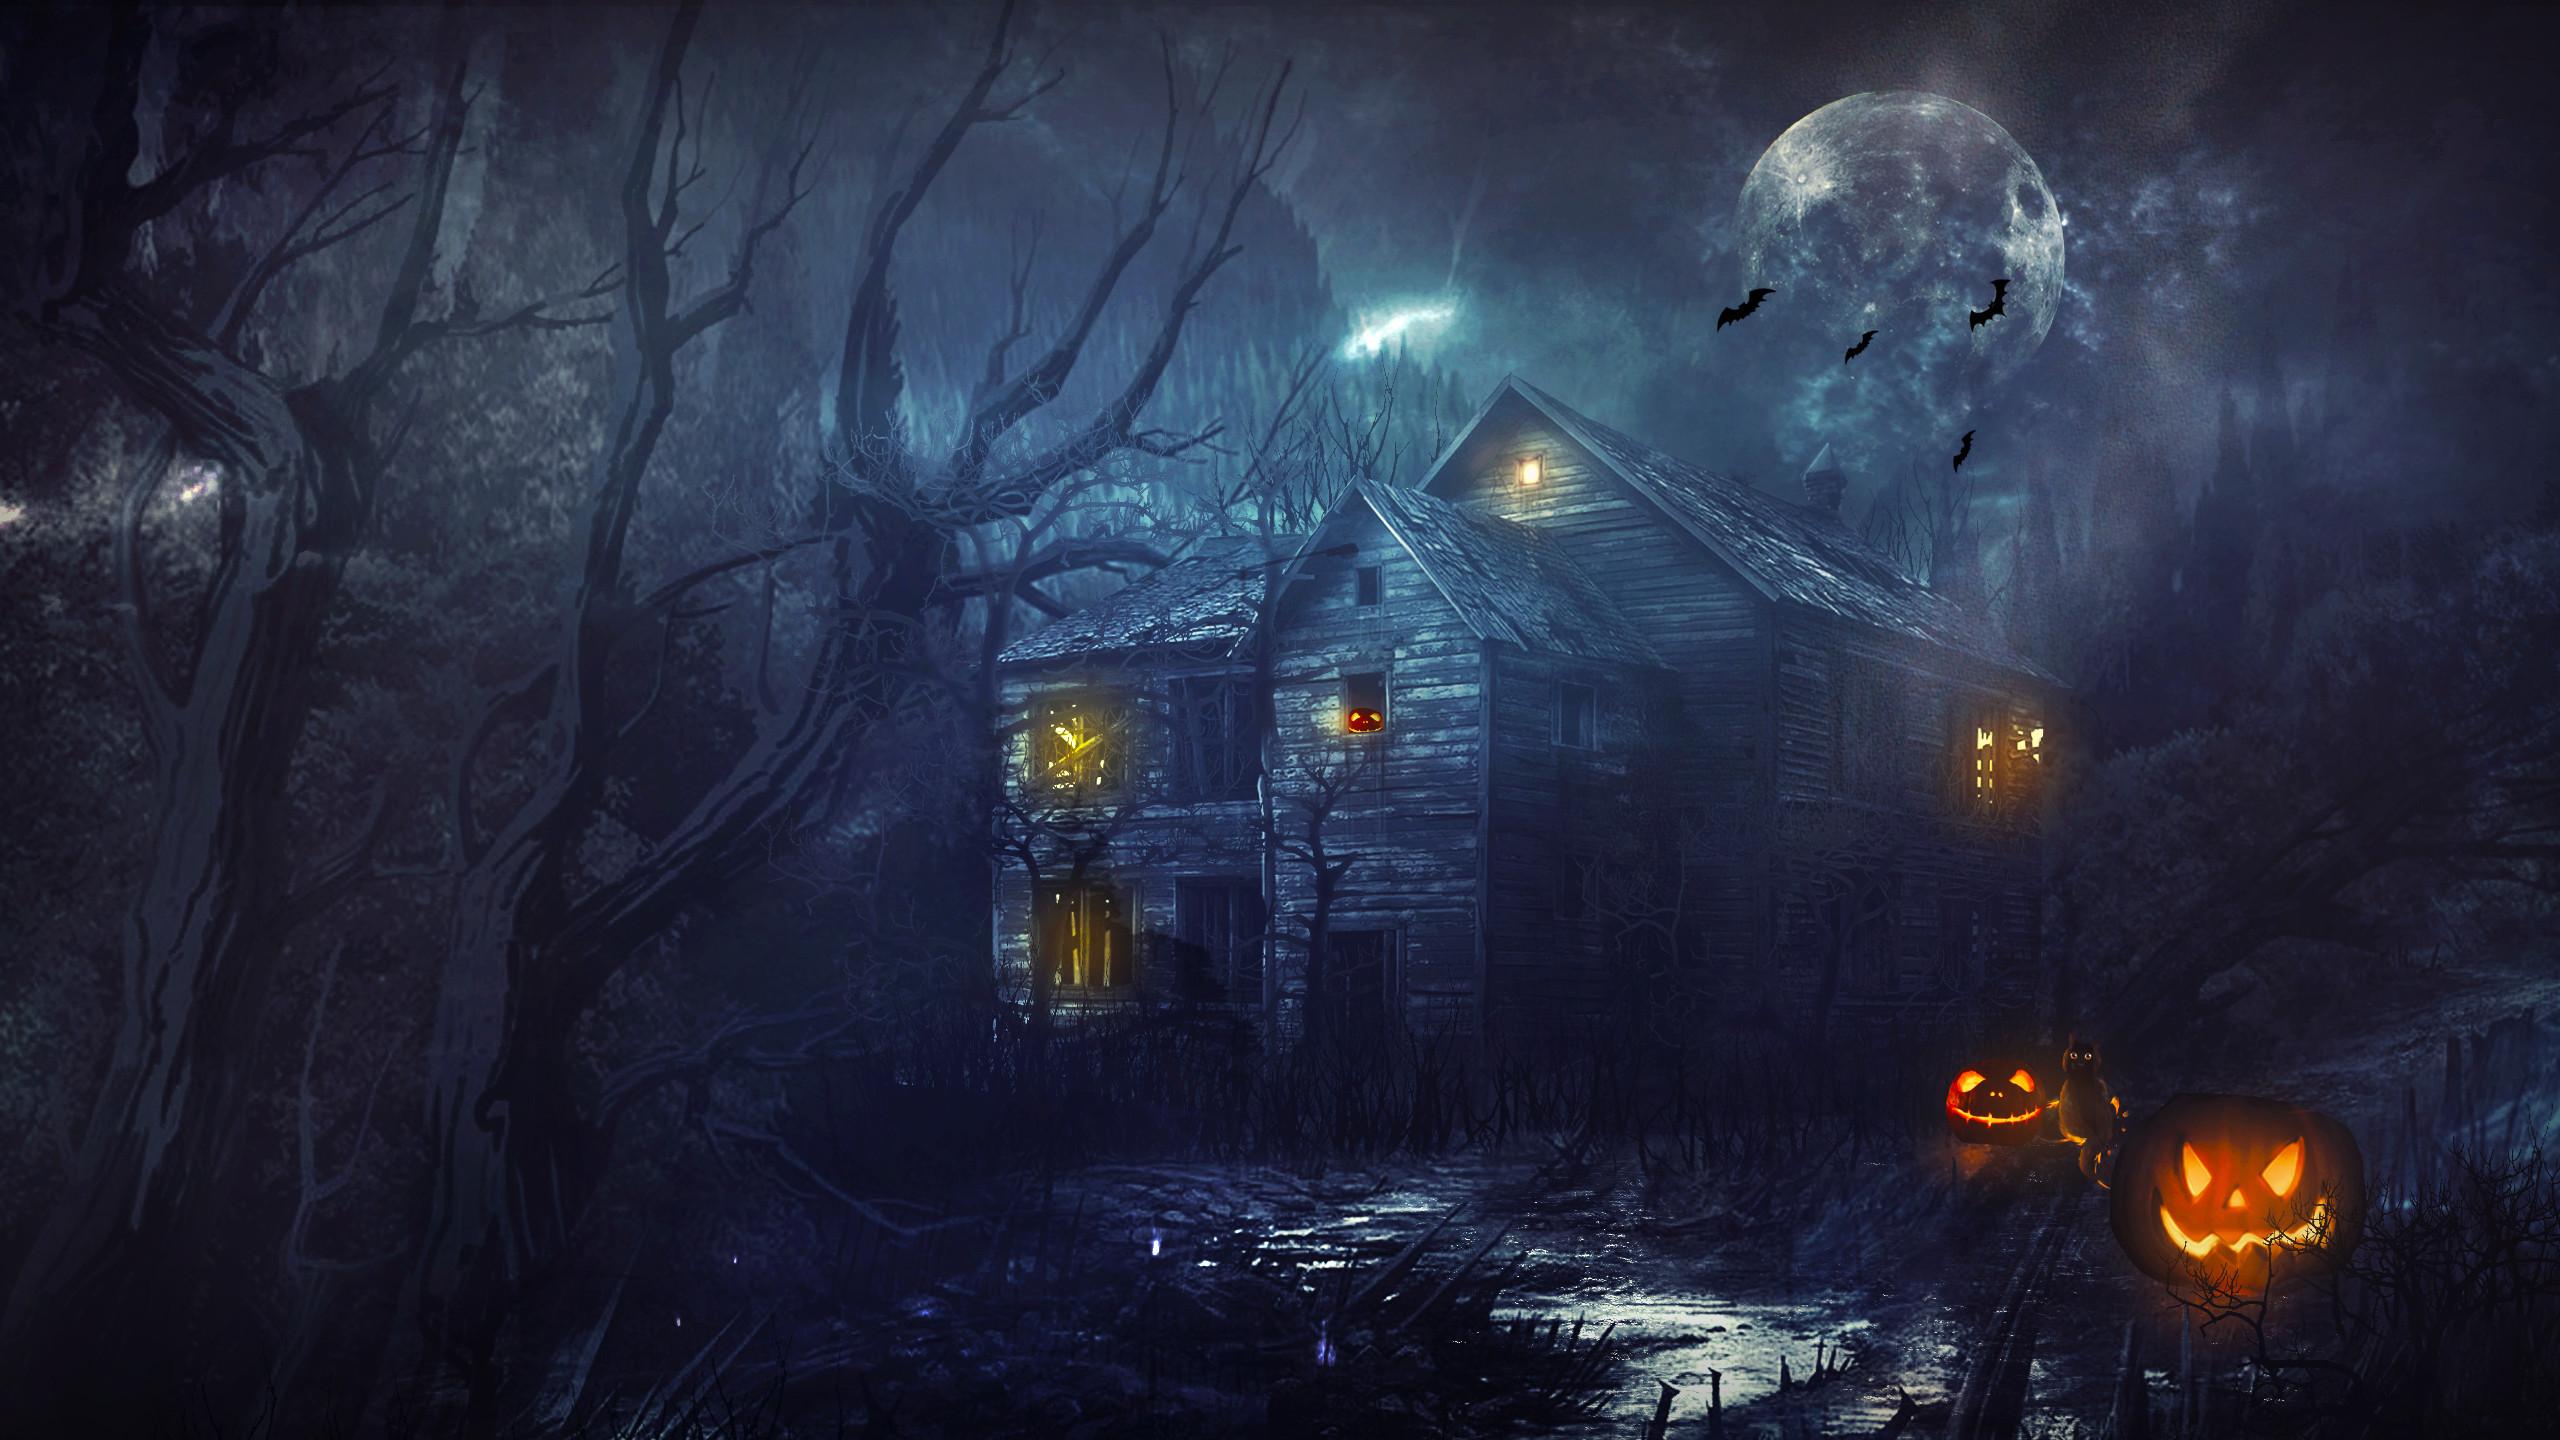 Celebrations / Halloween / Halloween house Wallpaper